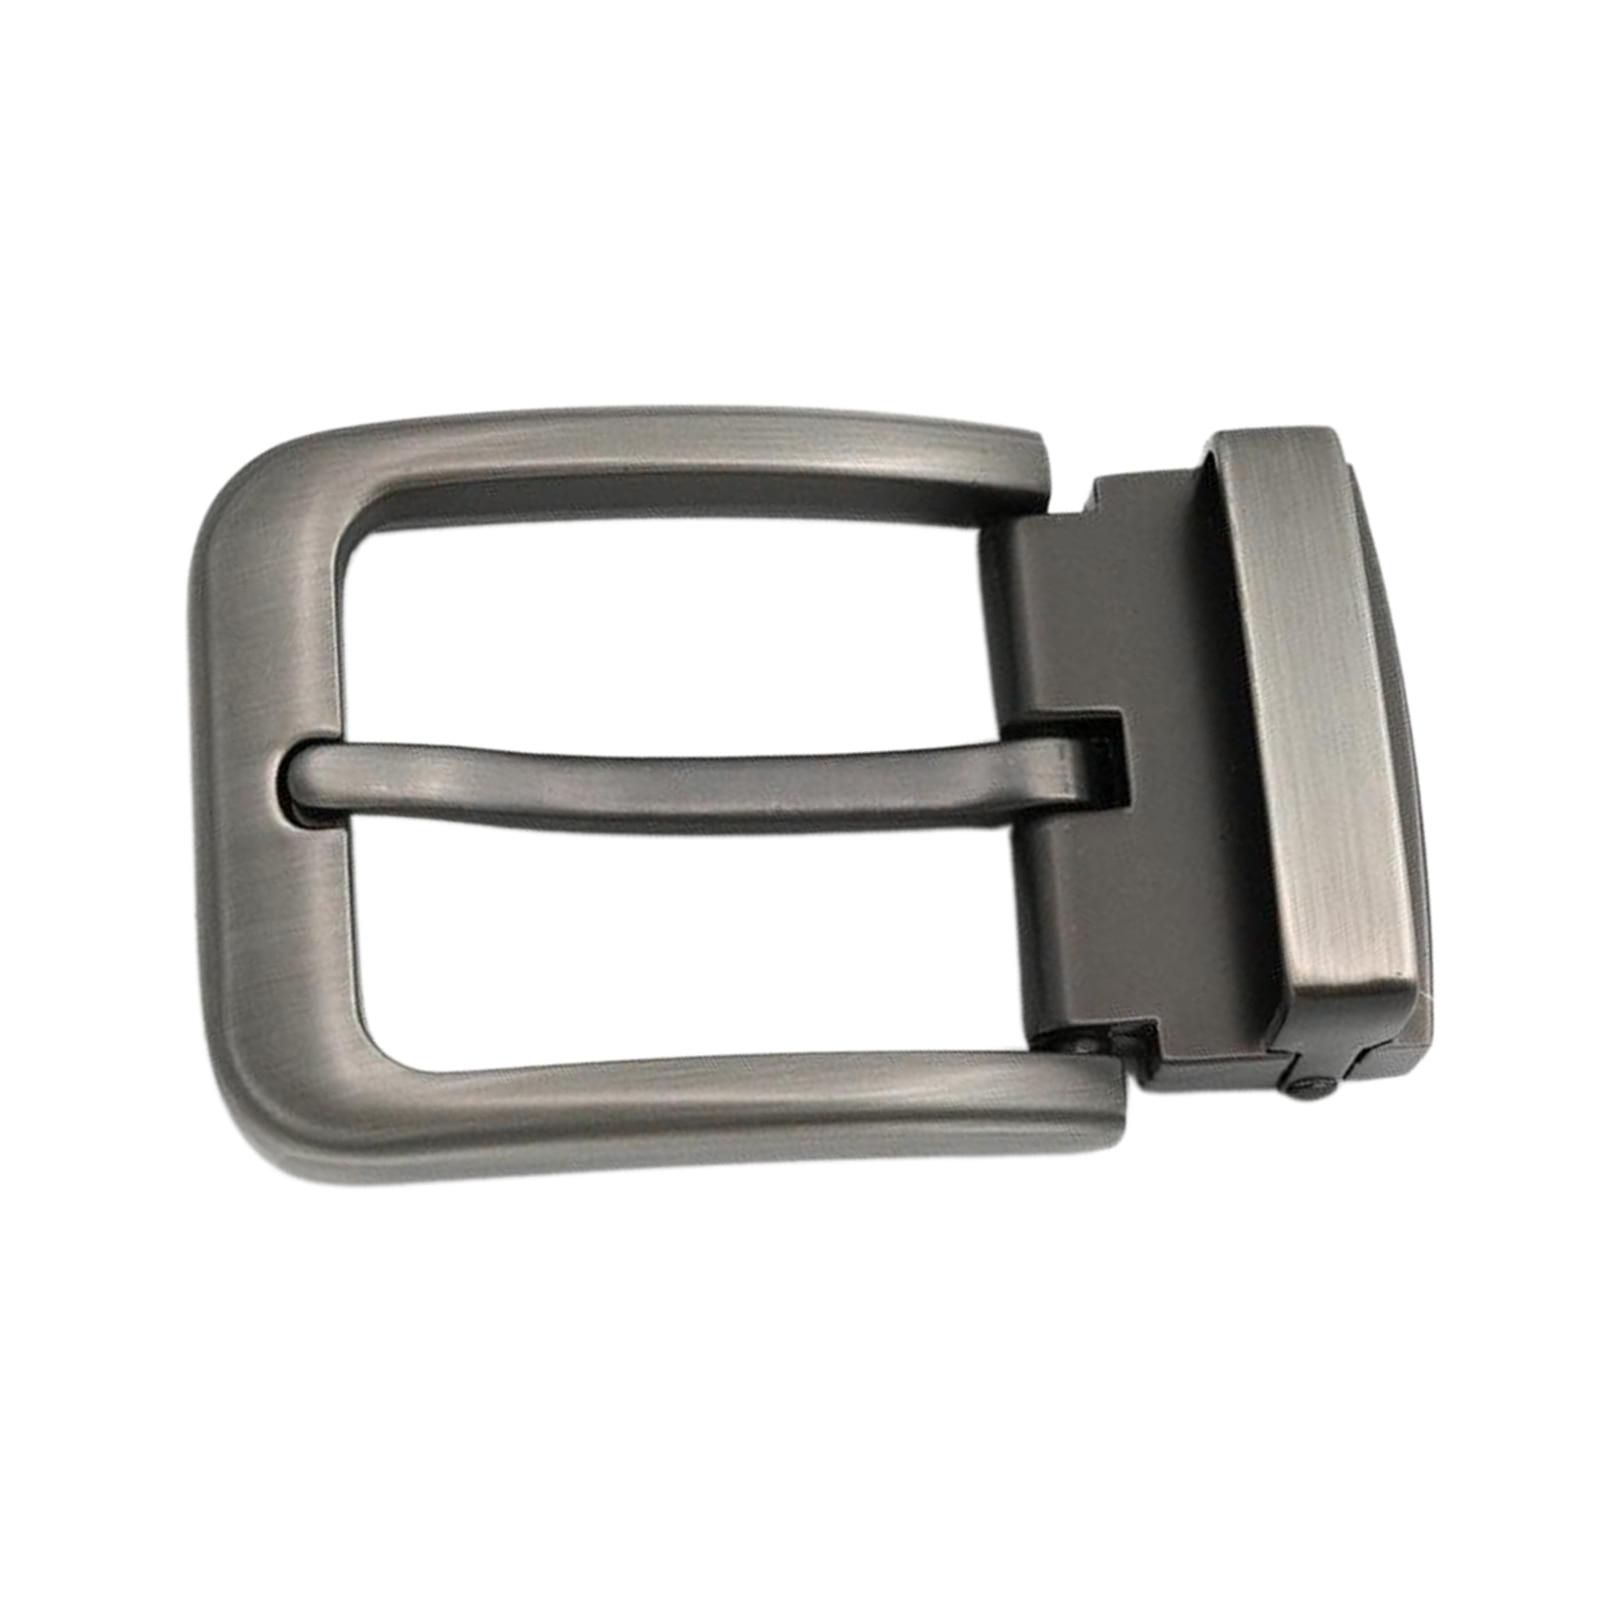 Mens Alloy Reversible Belt Buckle Replacement Antique Rectangular Pin Buckle for 33-34mm Belt